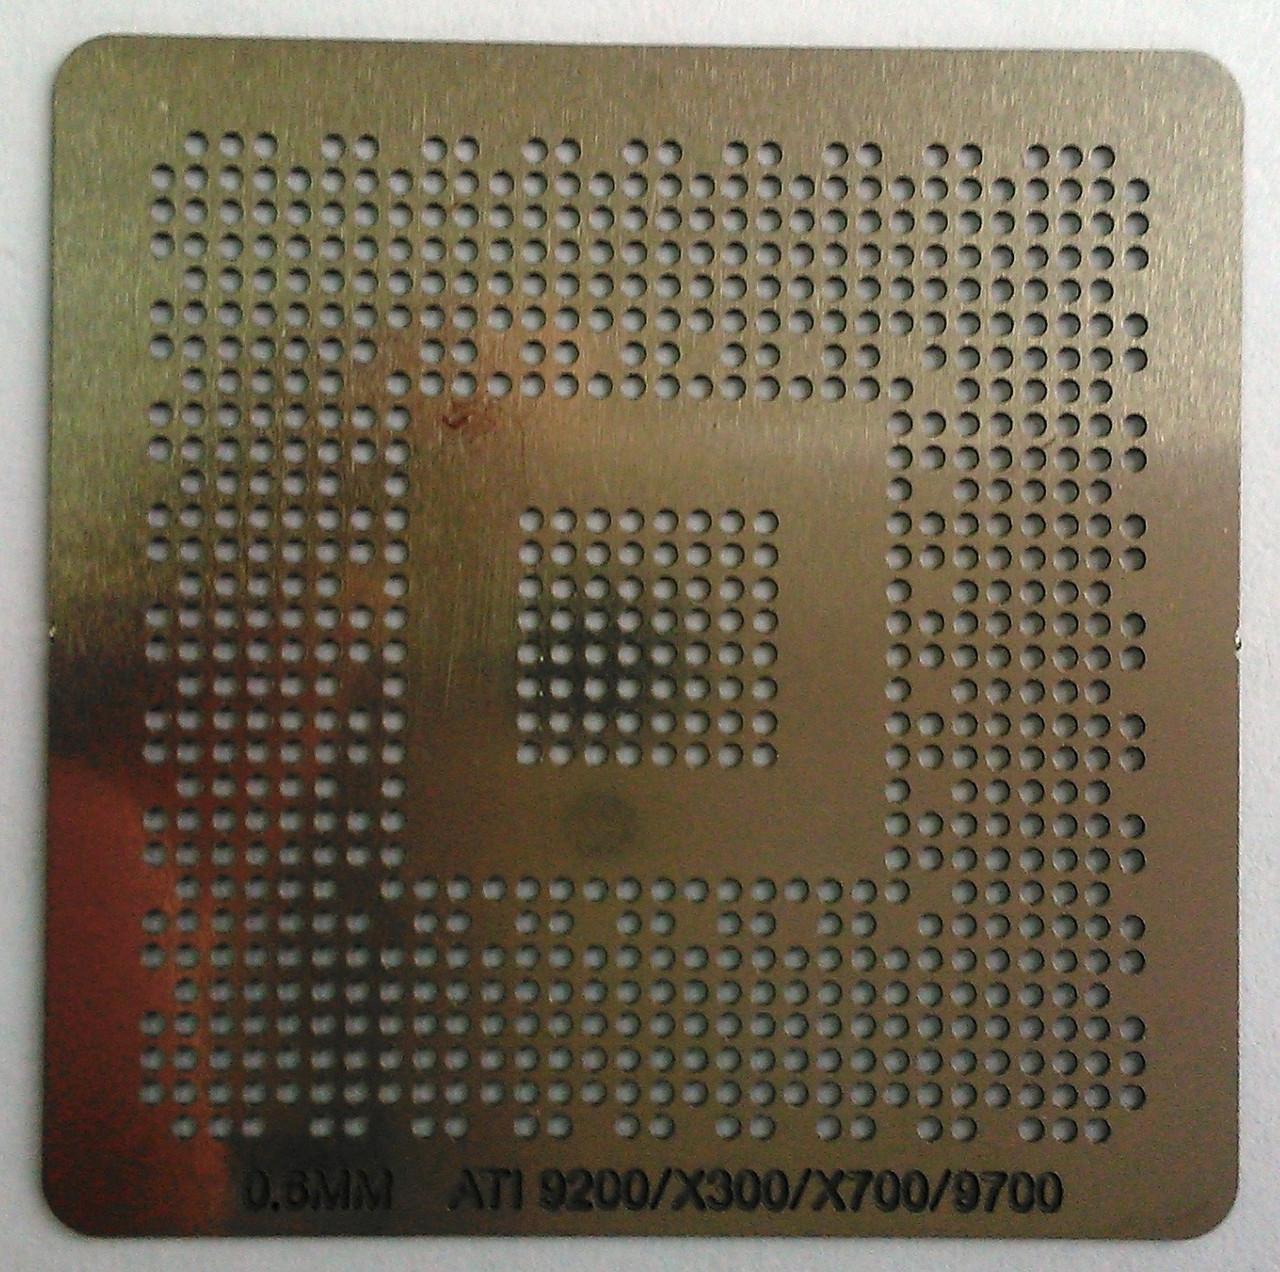 BGA трафарет 0,6mm ATI 9200/X300/X700/9700